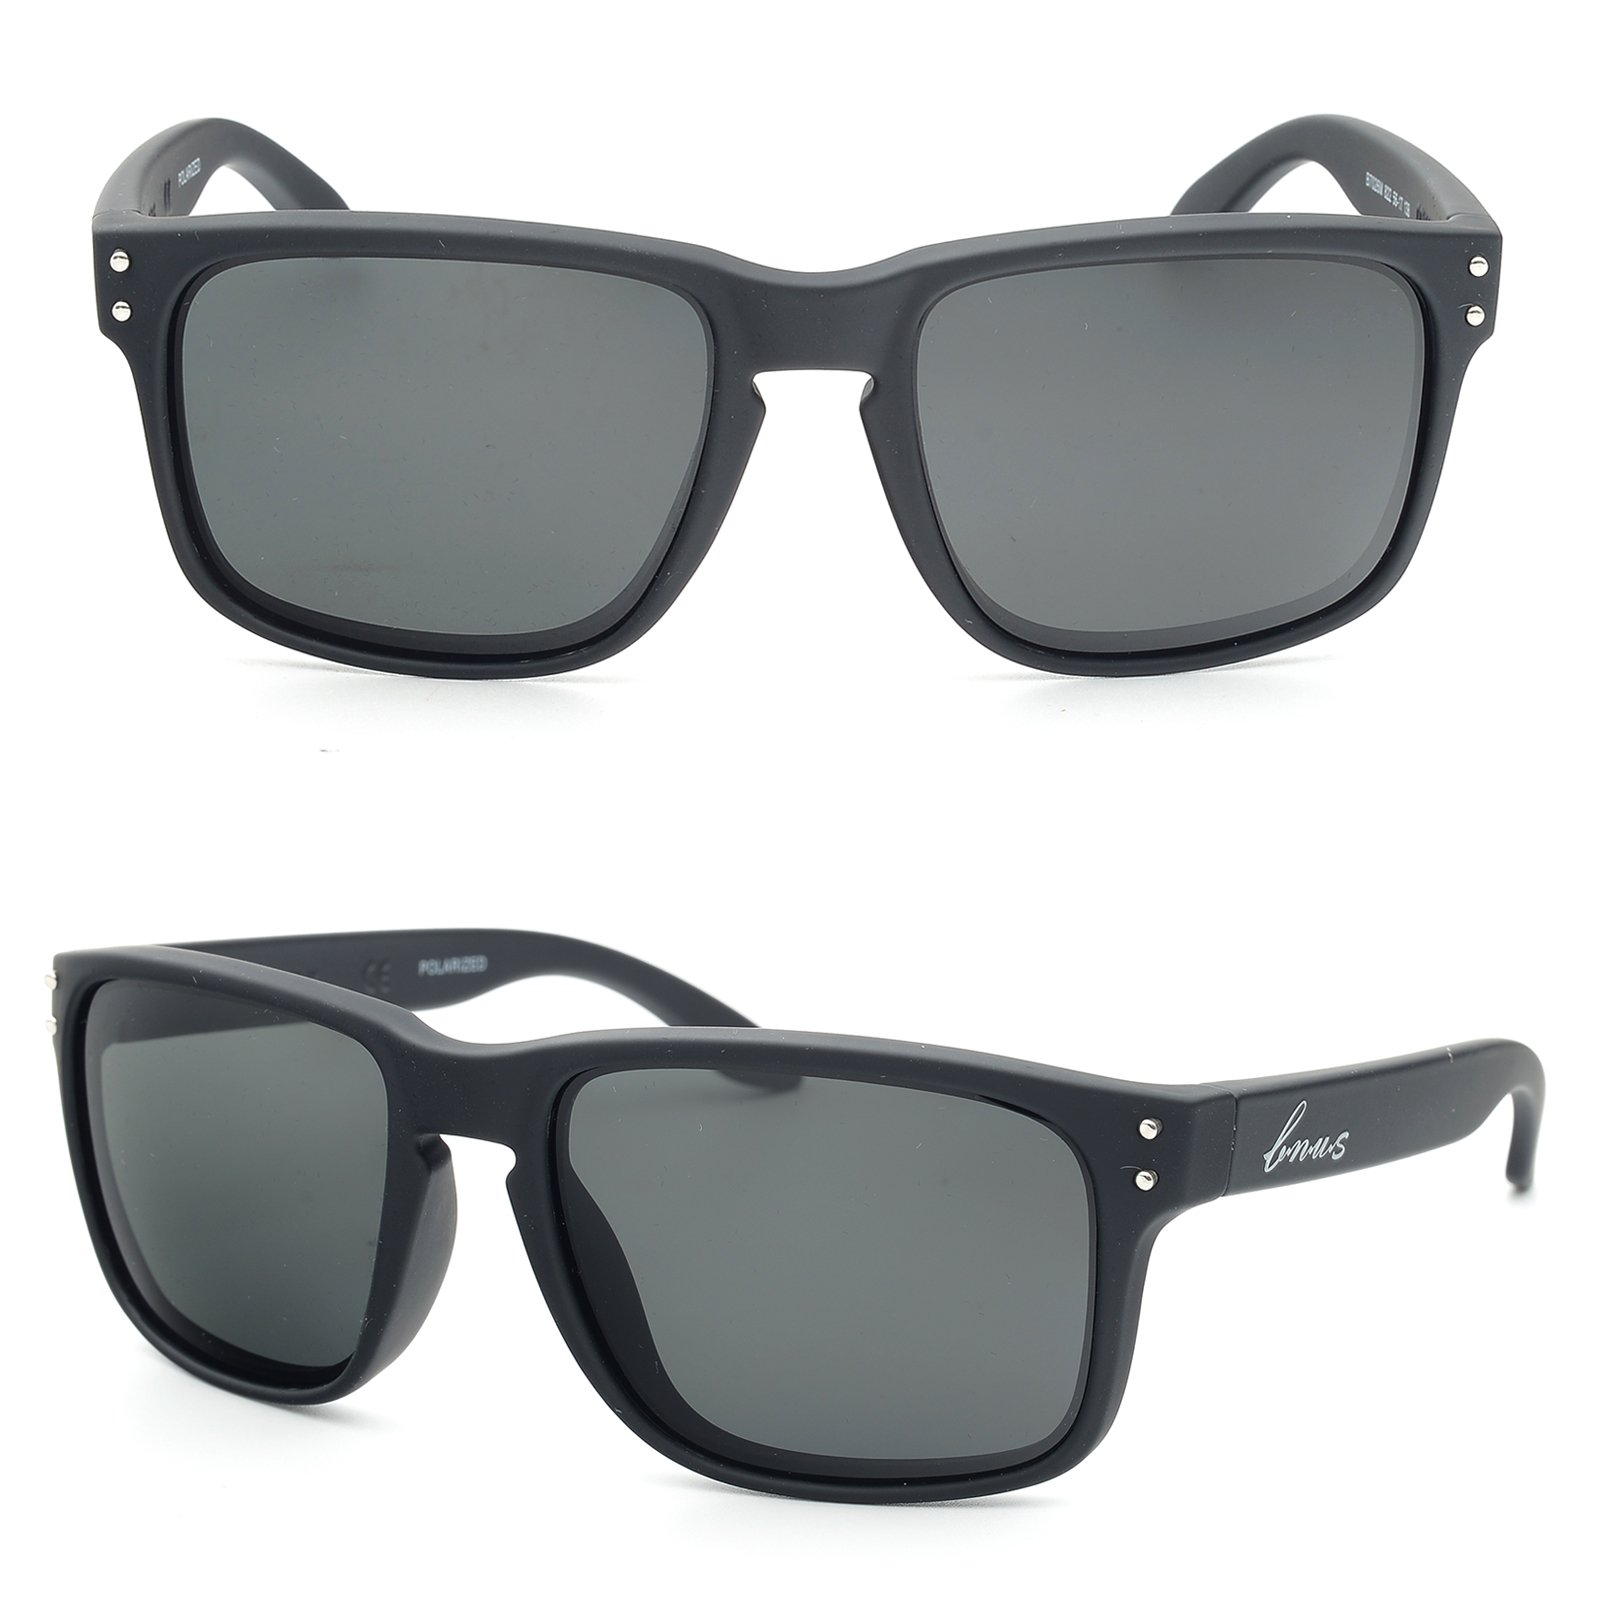 Bnus italy made classic sunglasses corning real glass lens w. polarized option (Matte Black/Grey, Polarized)